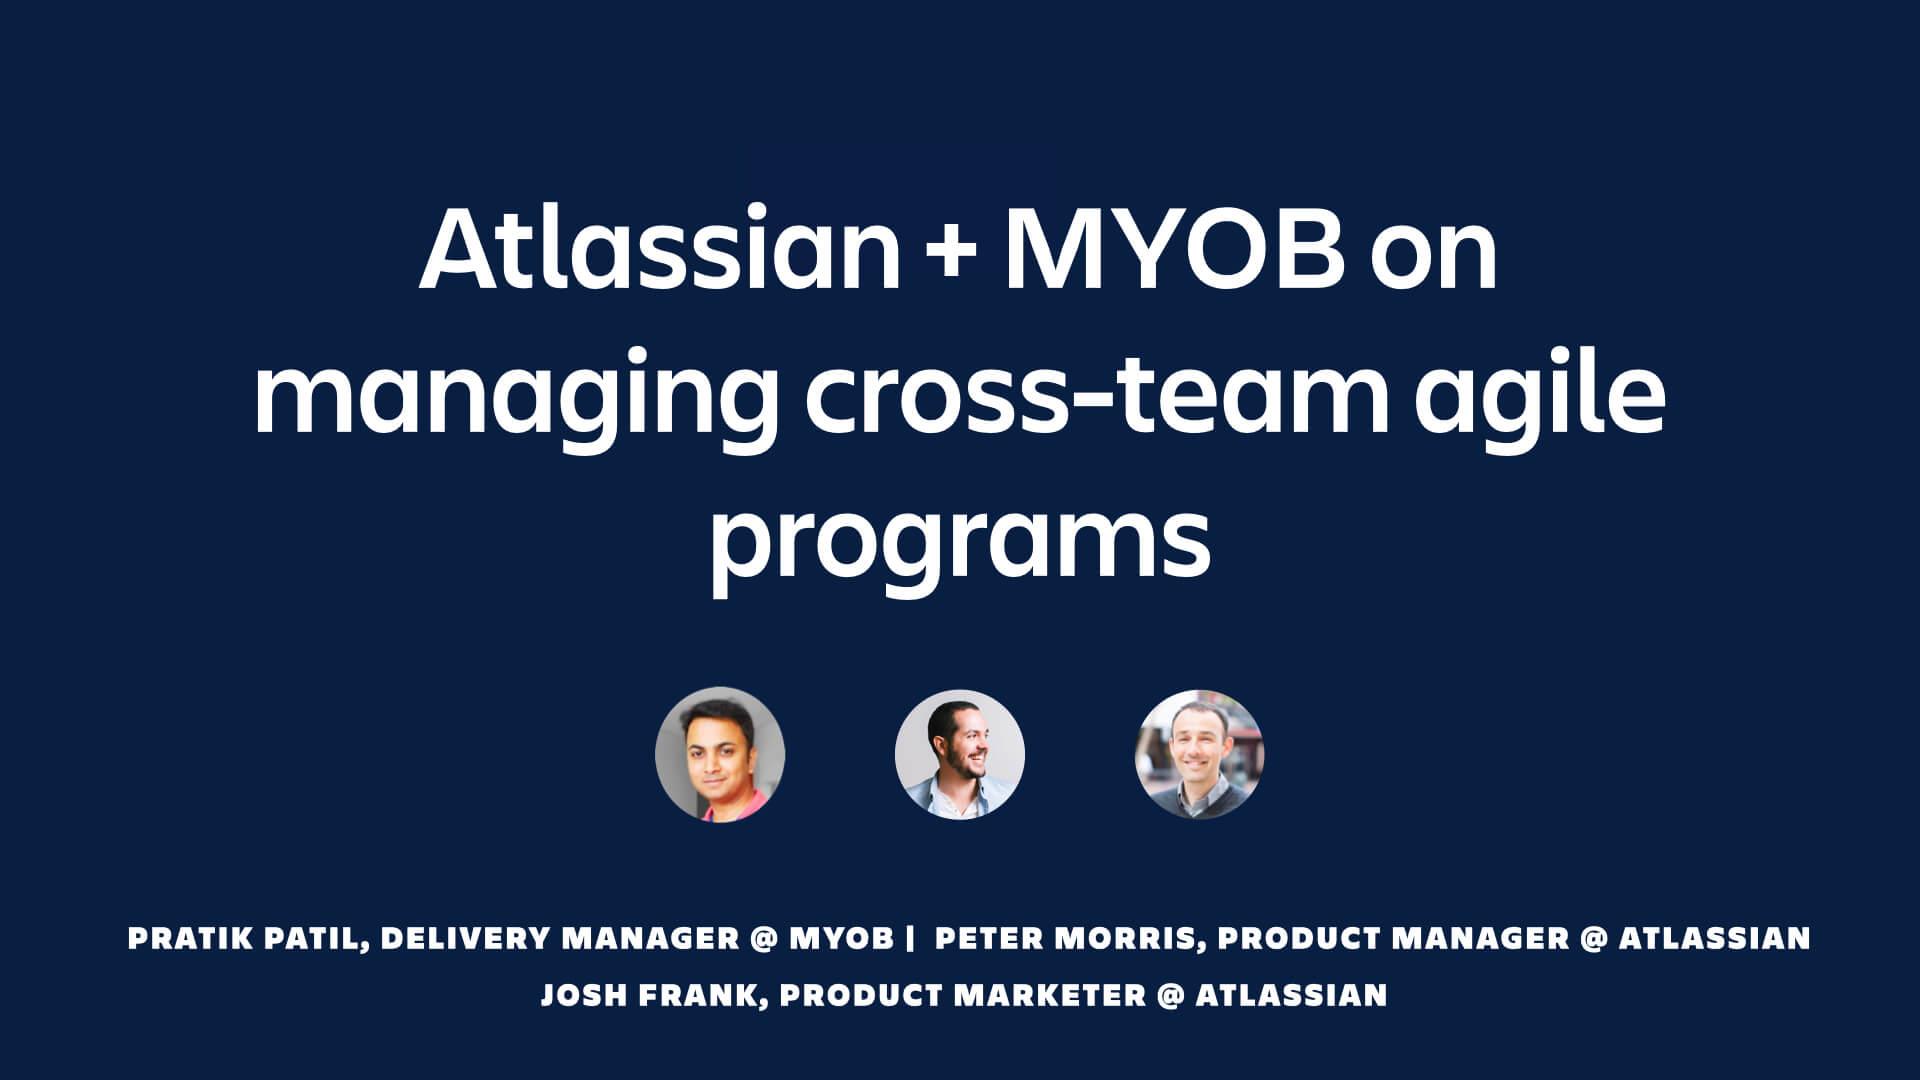 Atlassian and MYOB on managing cross-team agile programs